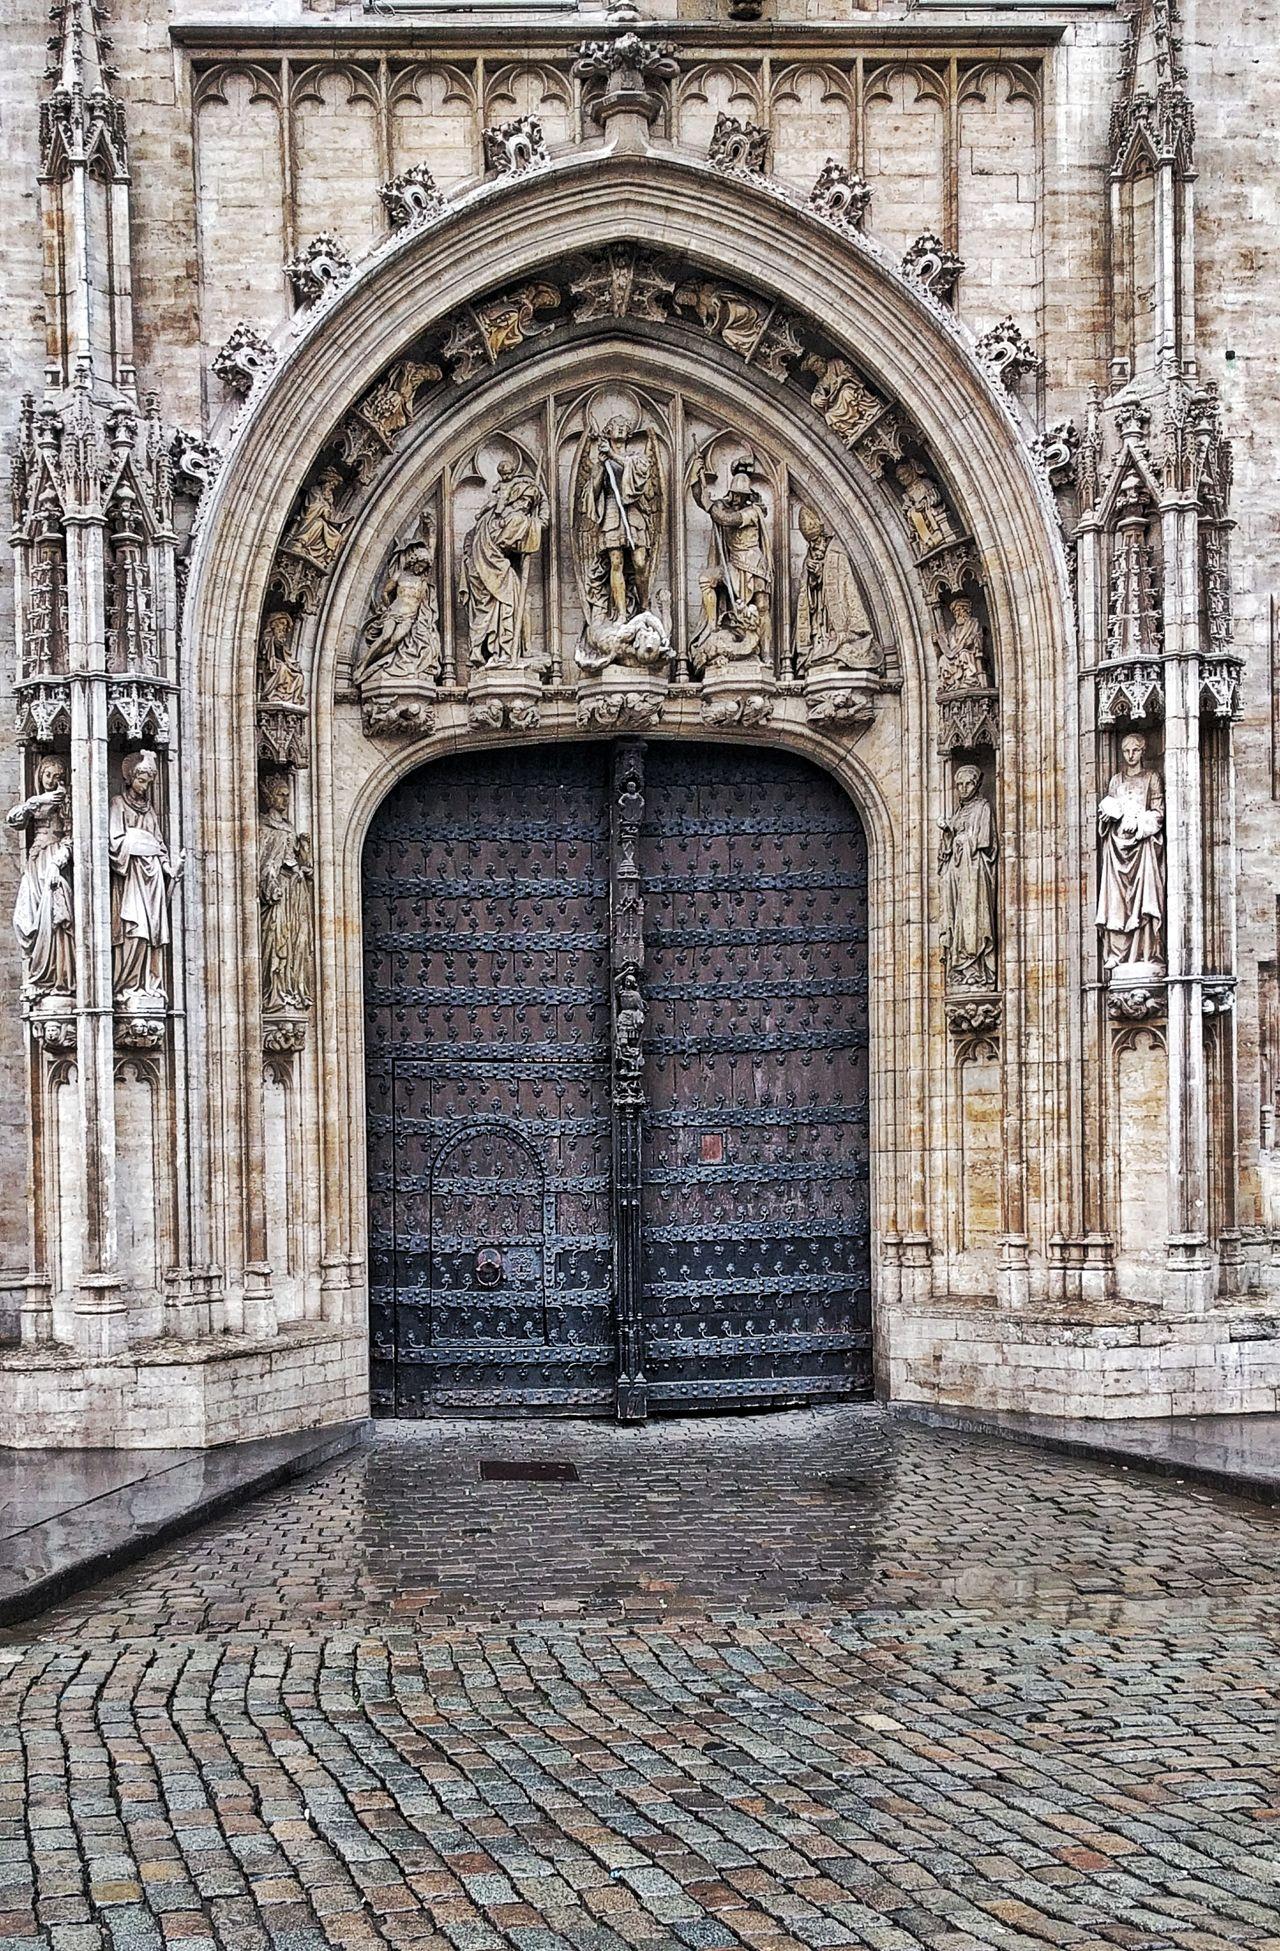 Arch Built Structure Architecture Travelphotography Travel Photography Travel Destinations Traveling Brussels❤️ Bruxelles Church Mideval Building